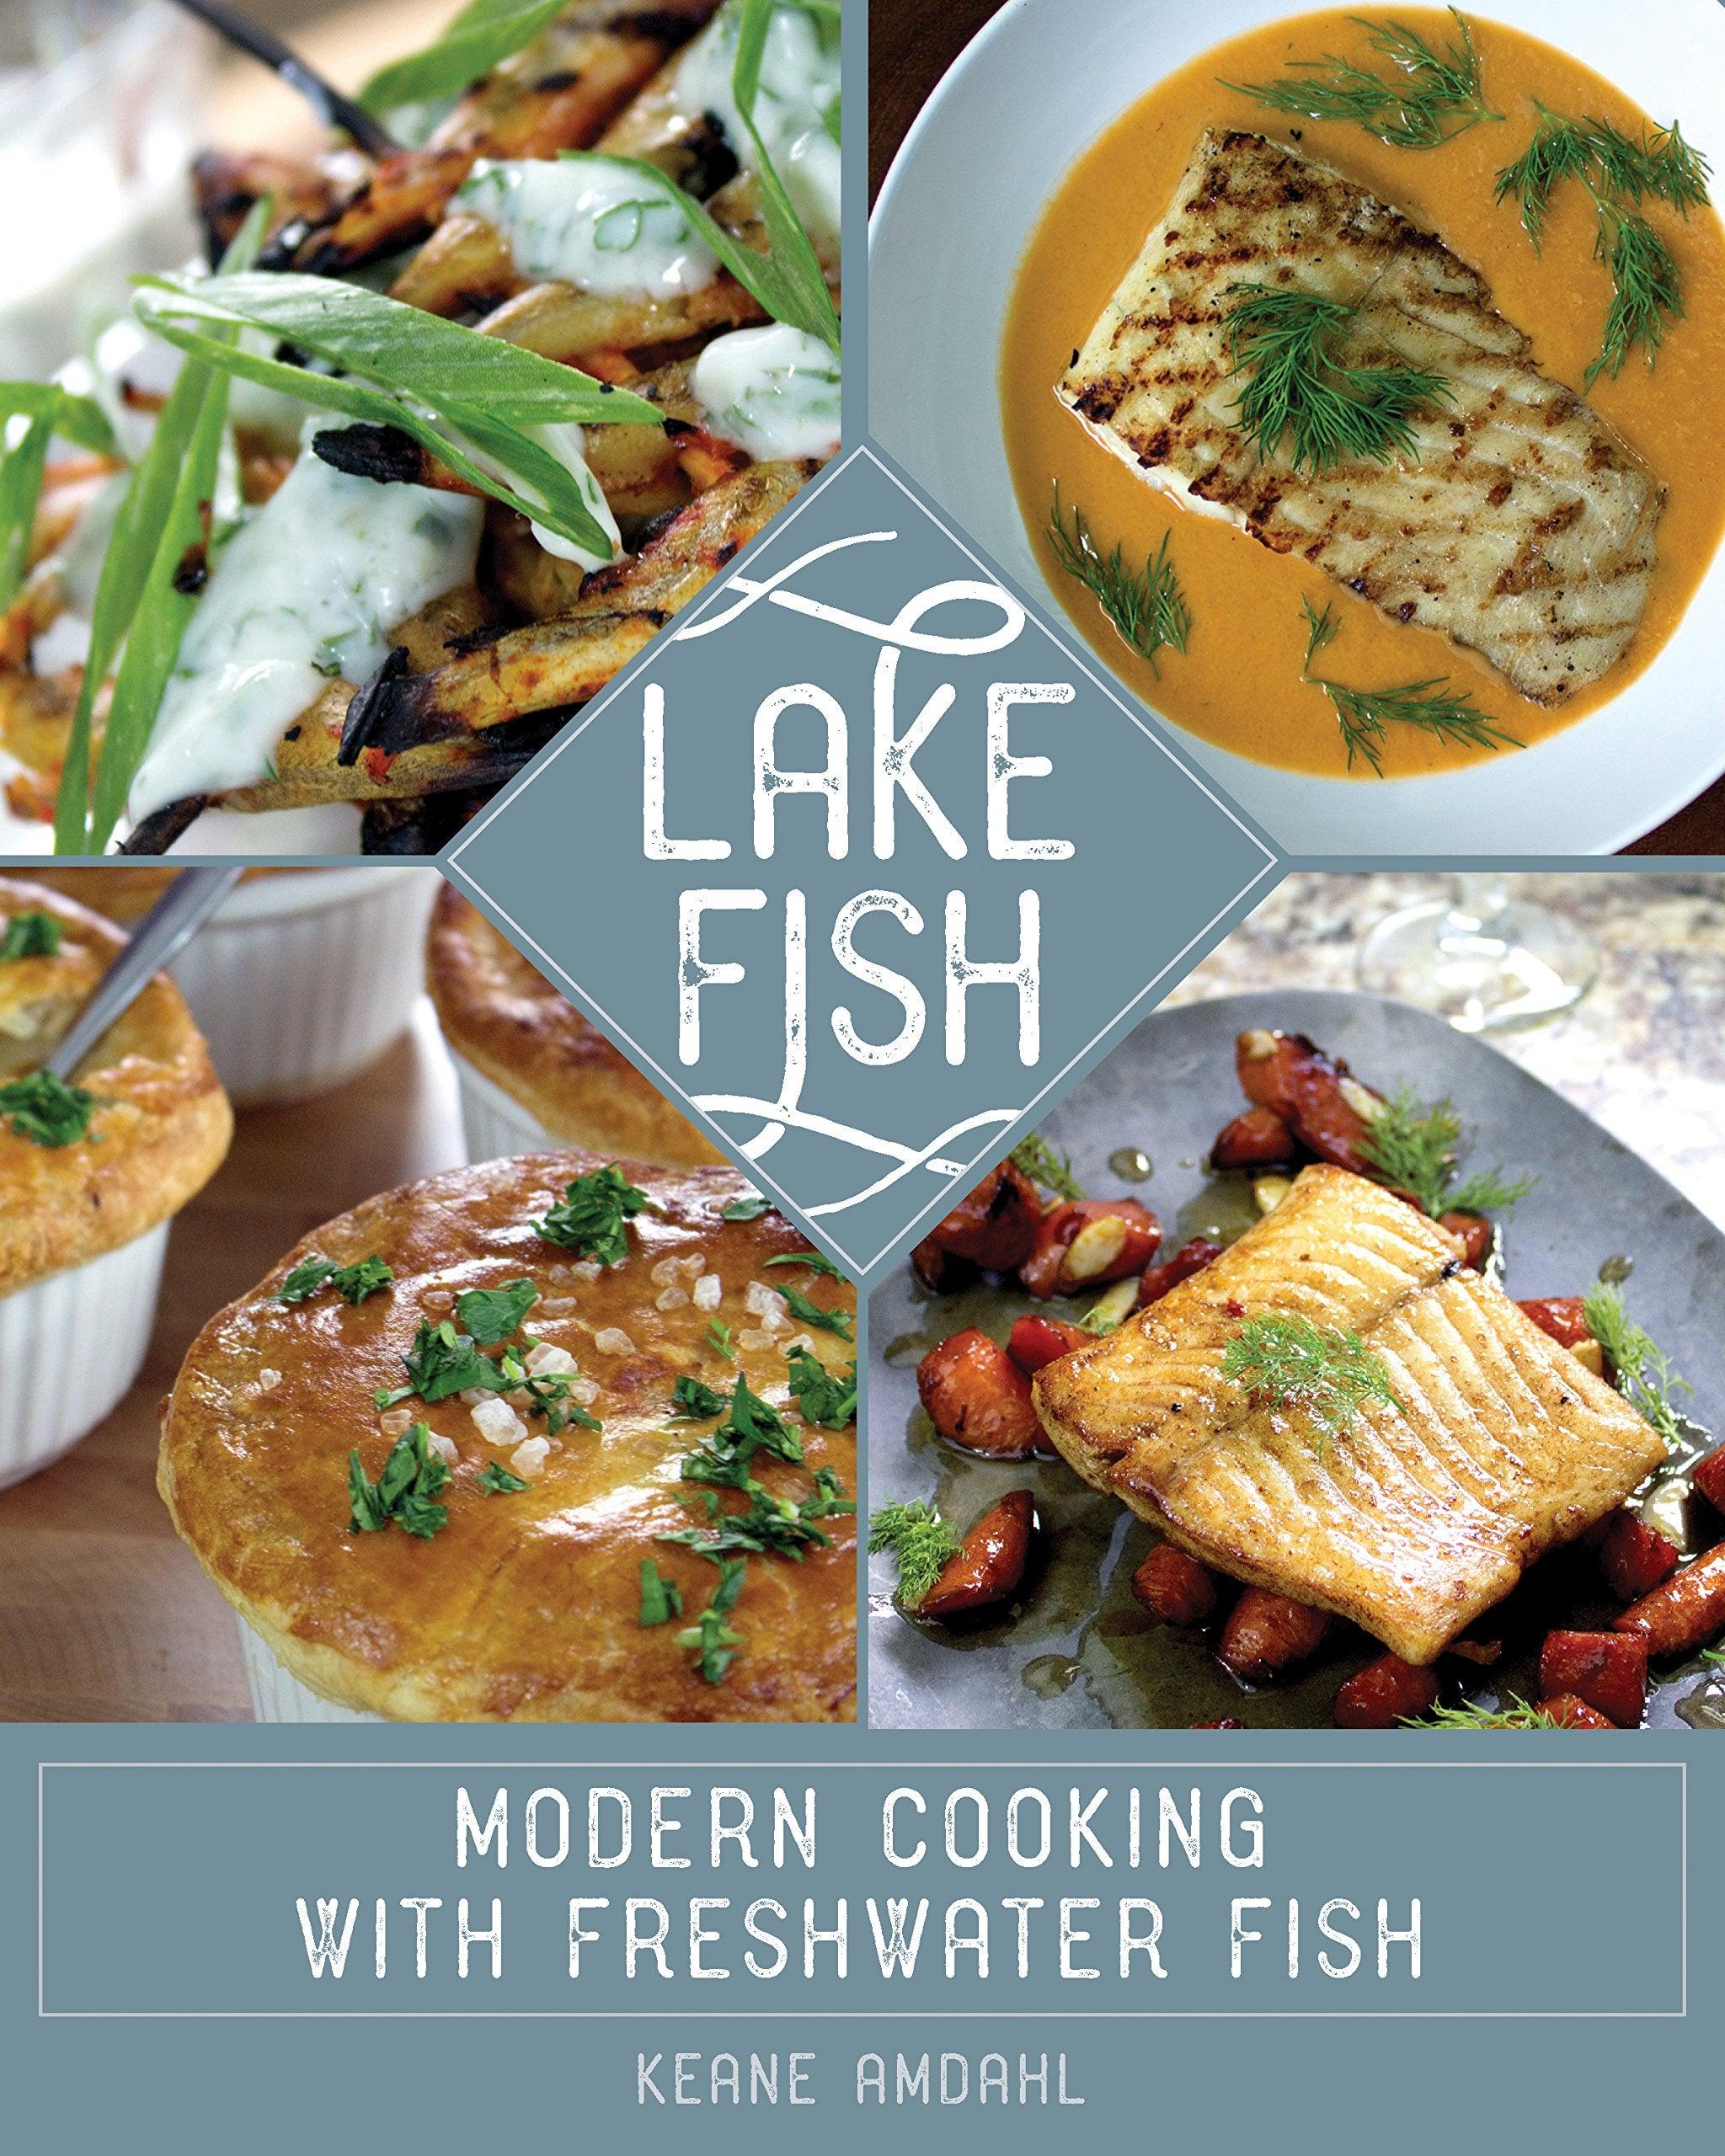 lake fish wild cookbook